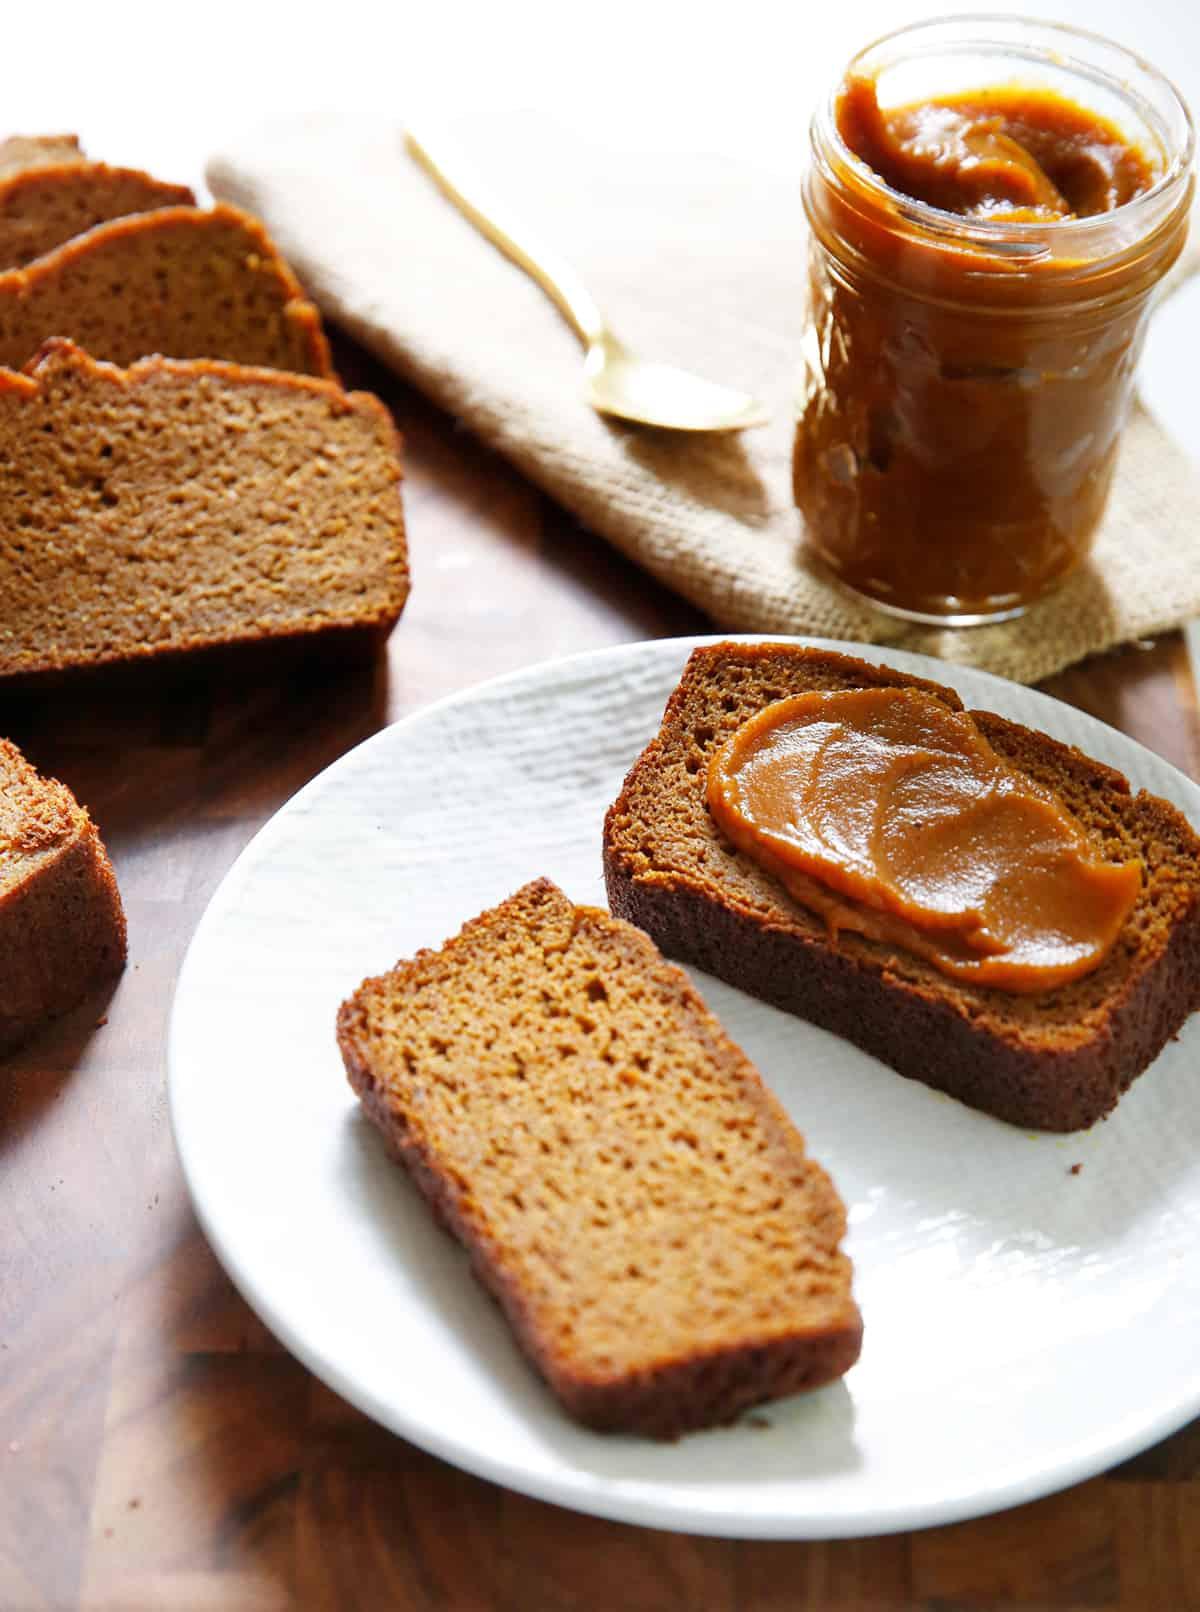 slice of paleo pumpkin bread with pumpkin butter on a plate